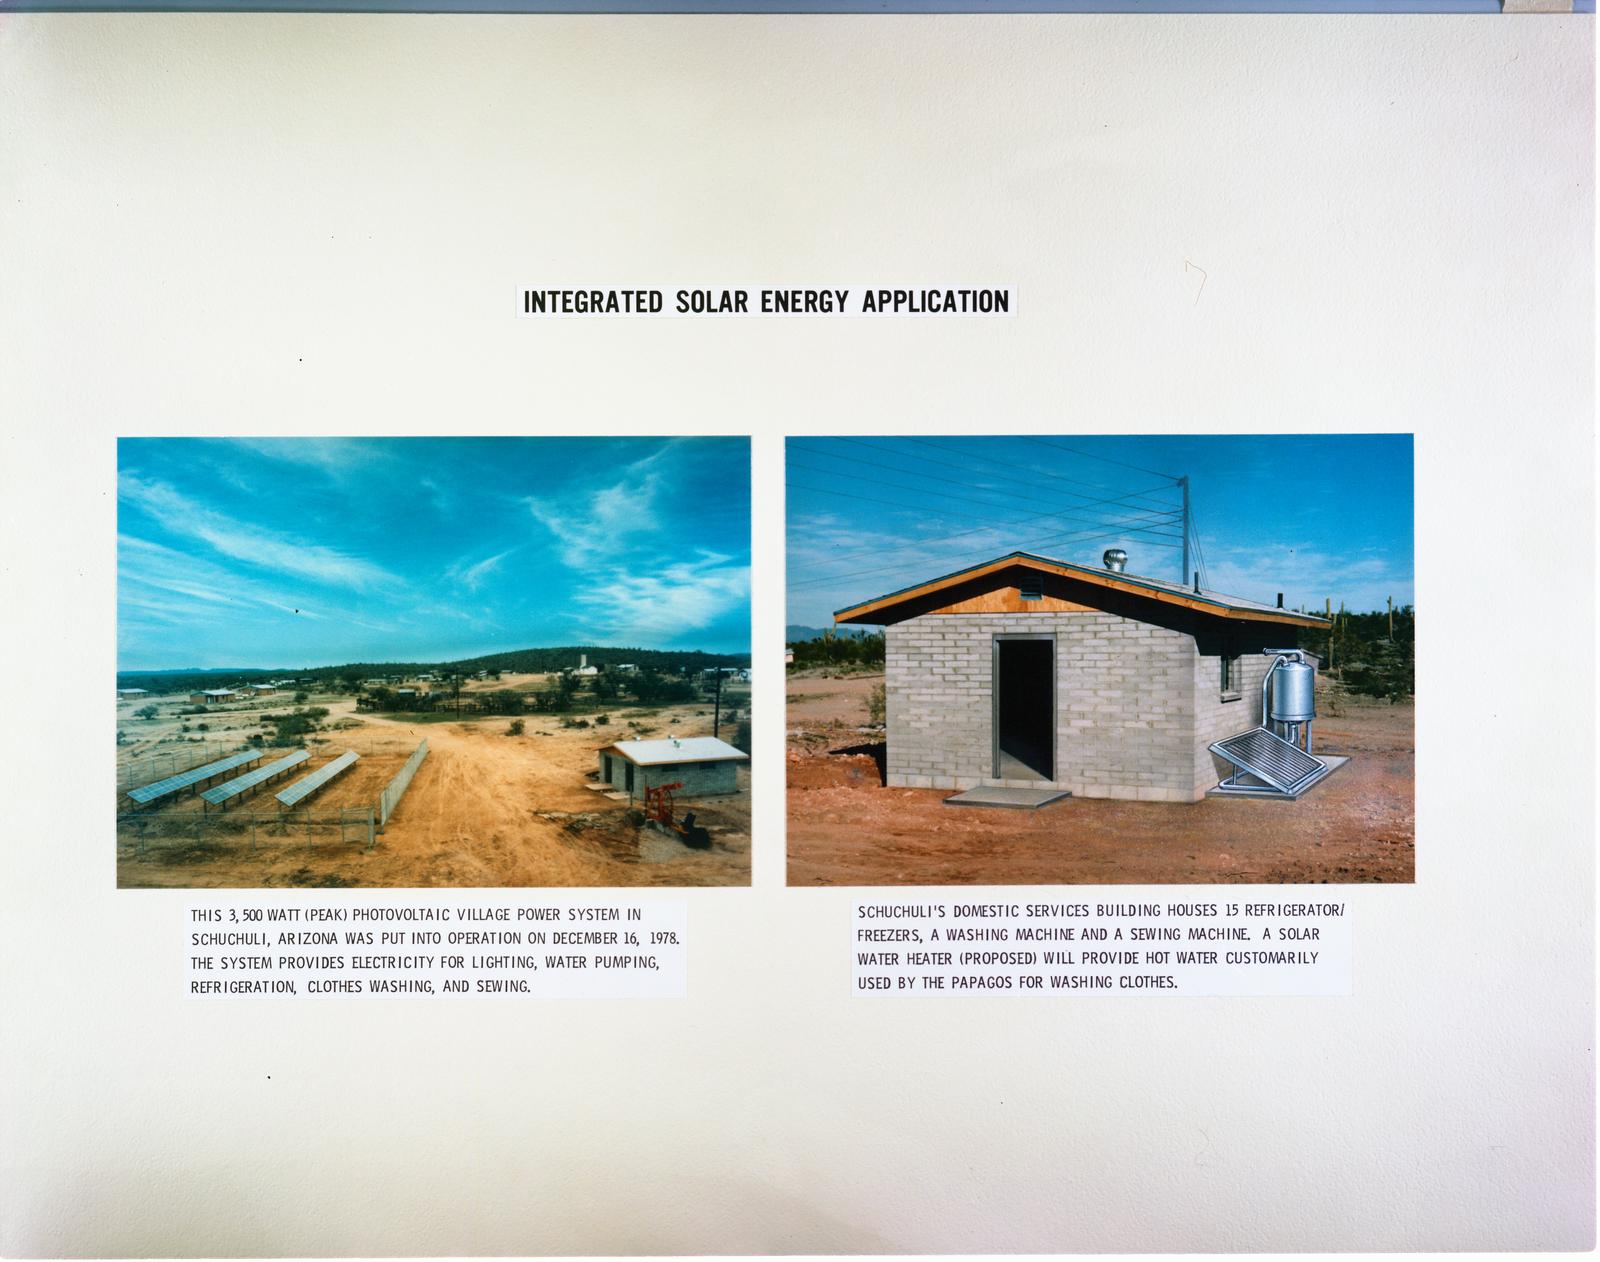 INTEGRATED SOLAR ENERGY APPLICATION IN ARIZONA - PICRYL